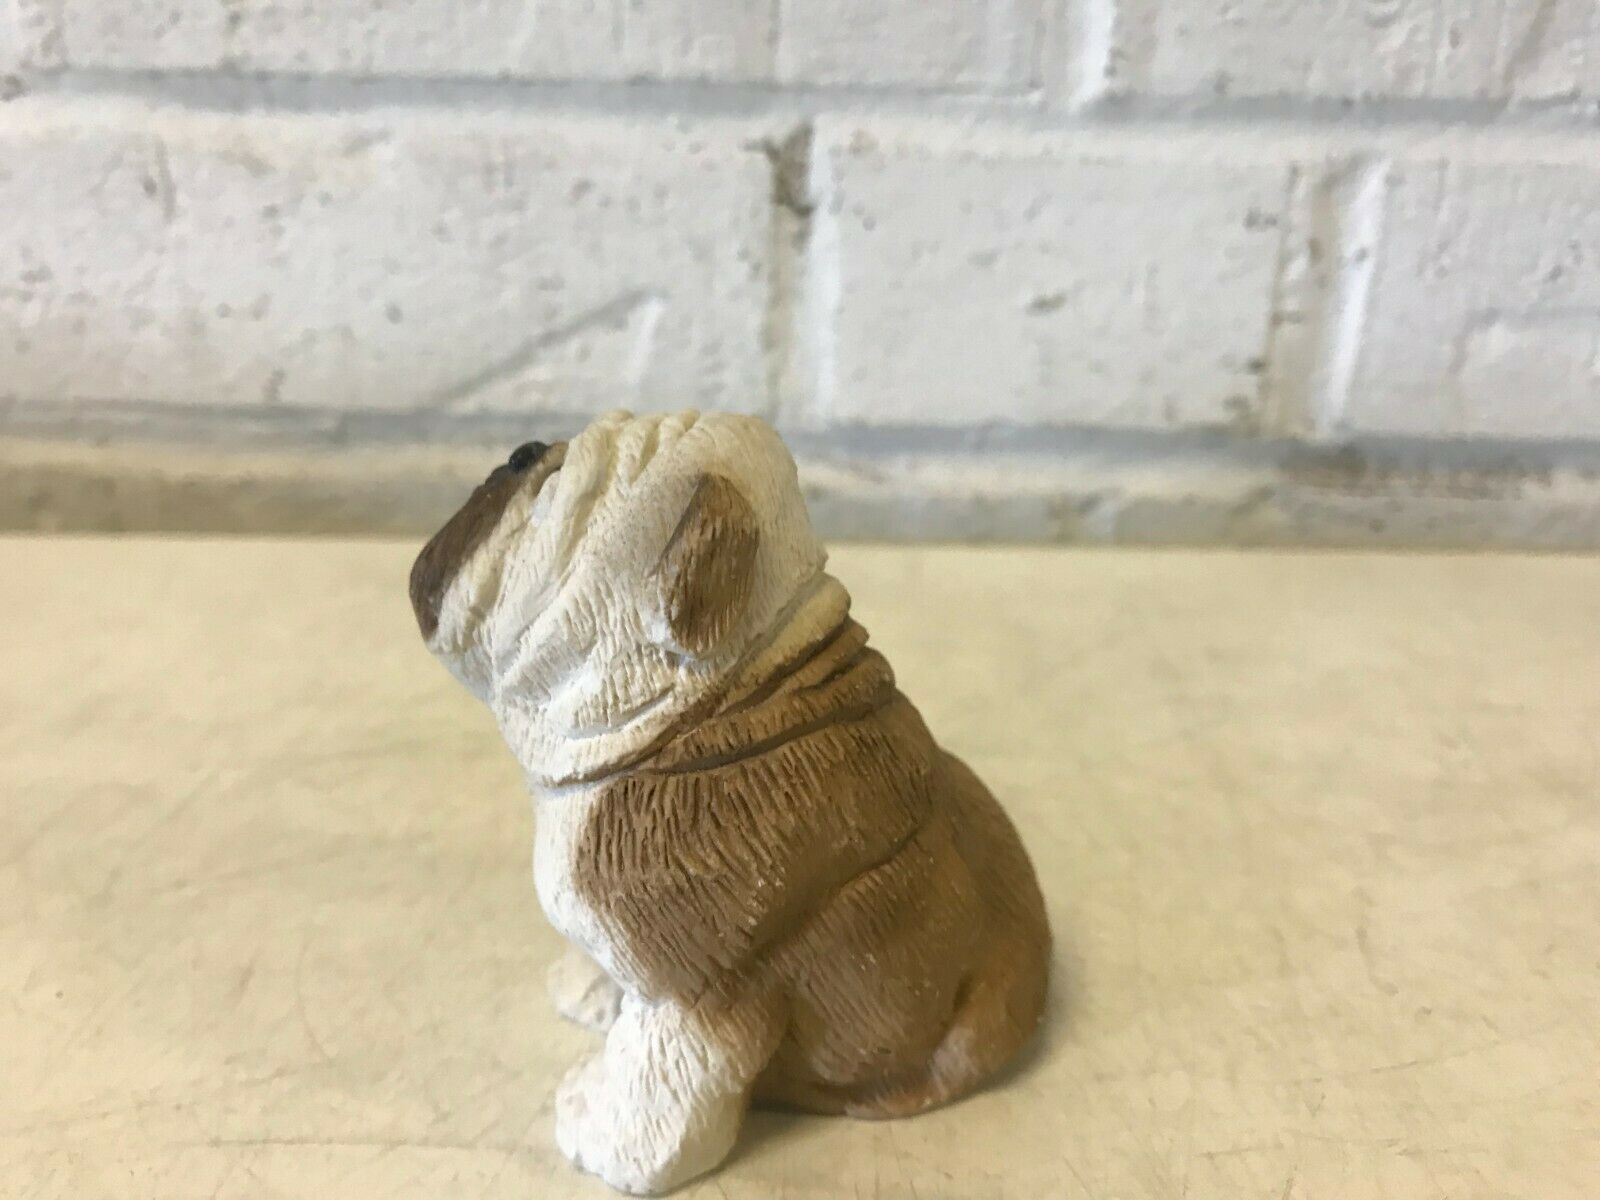 Pierre critters bulldog anglais figurine assis sc 022 1984 united design